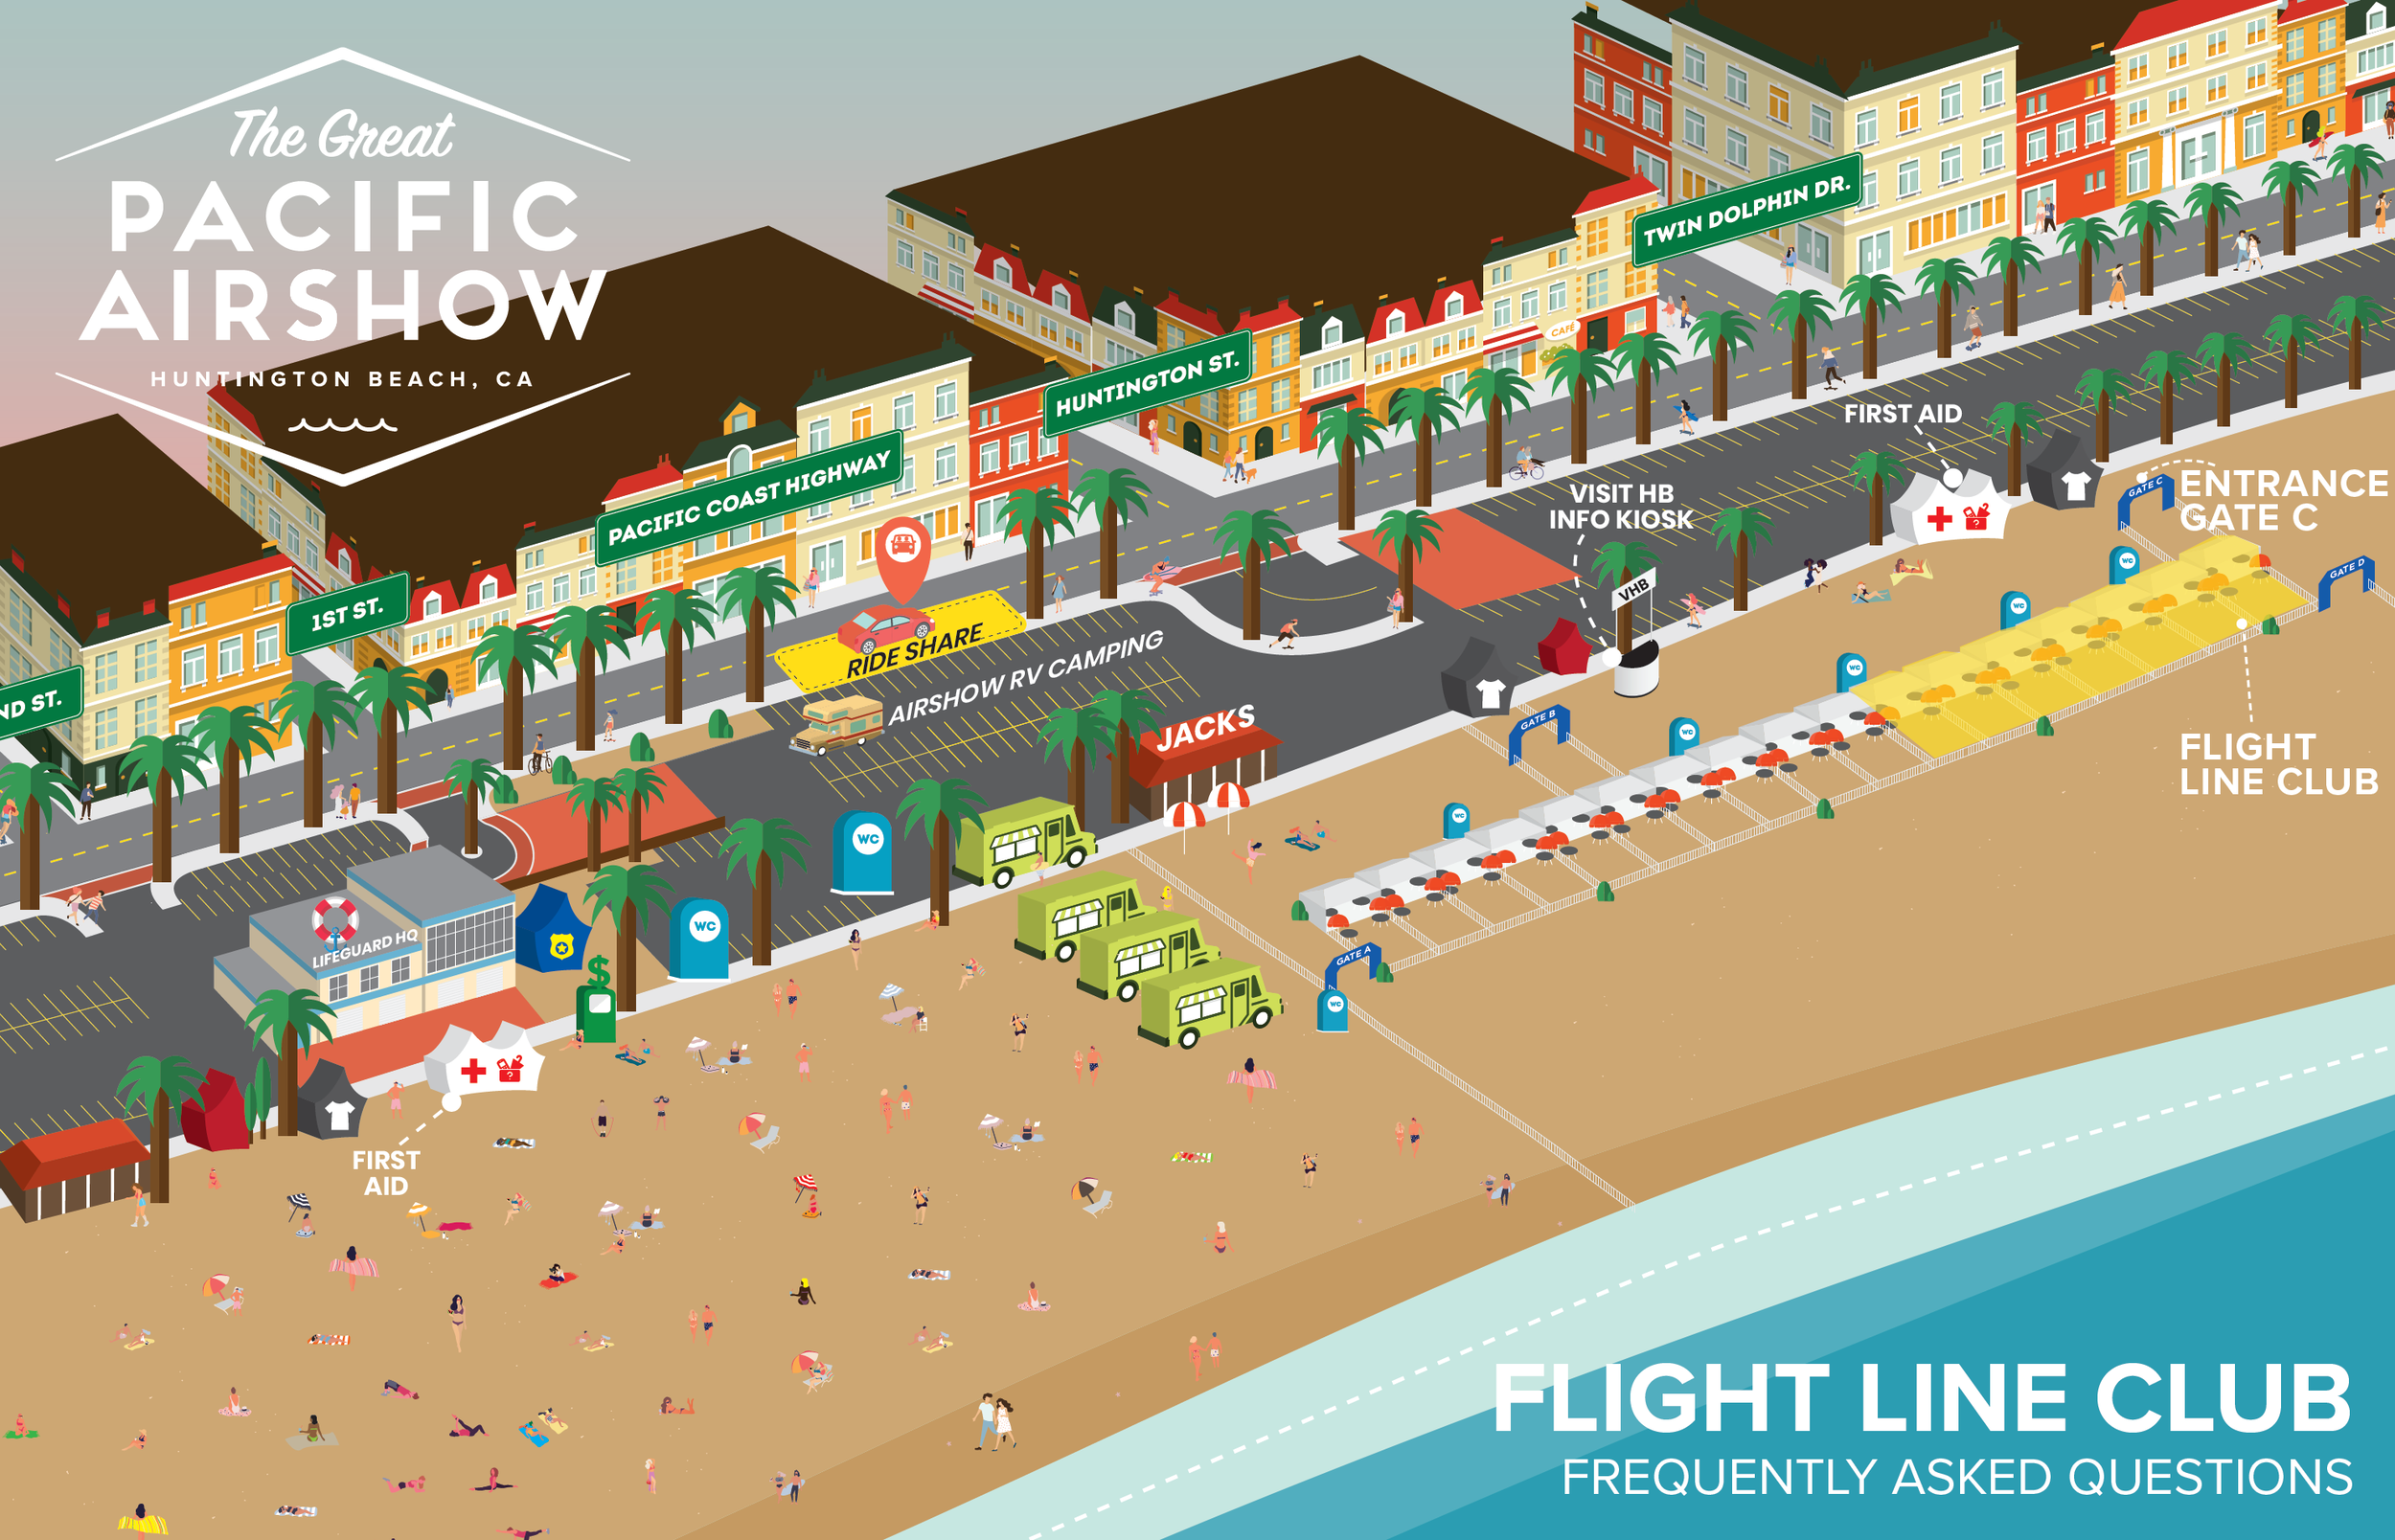 flight line club map.png